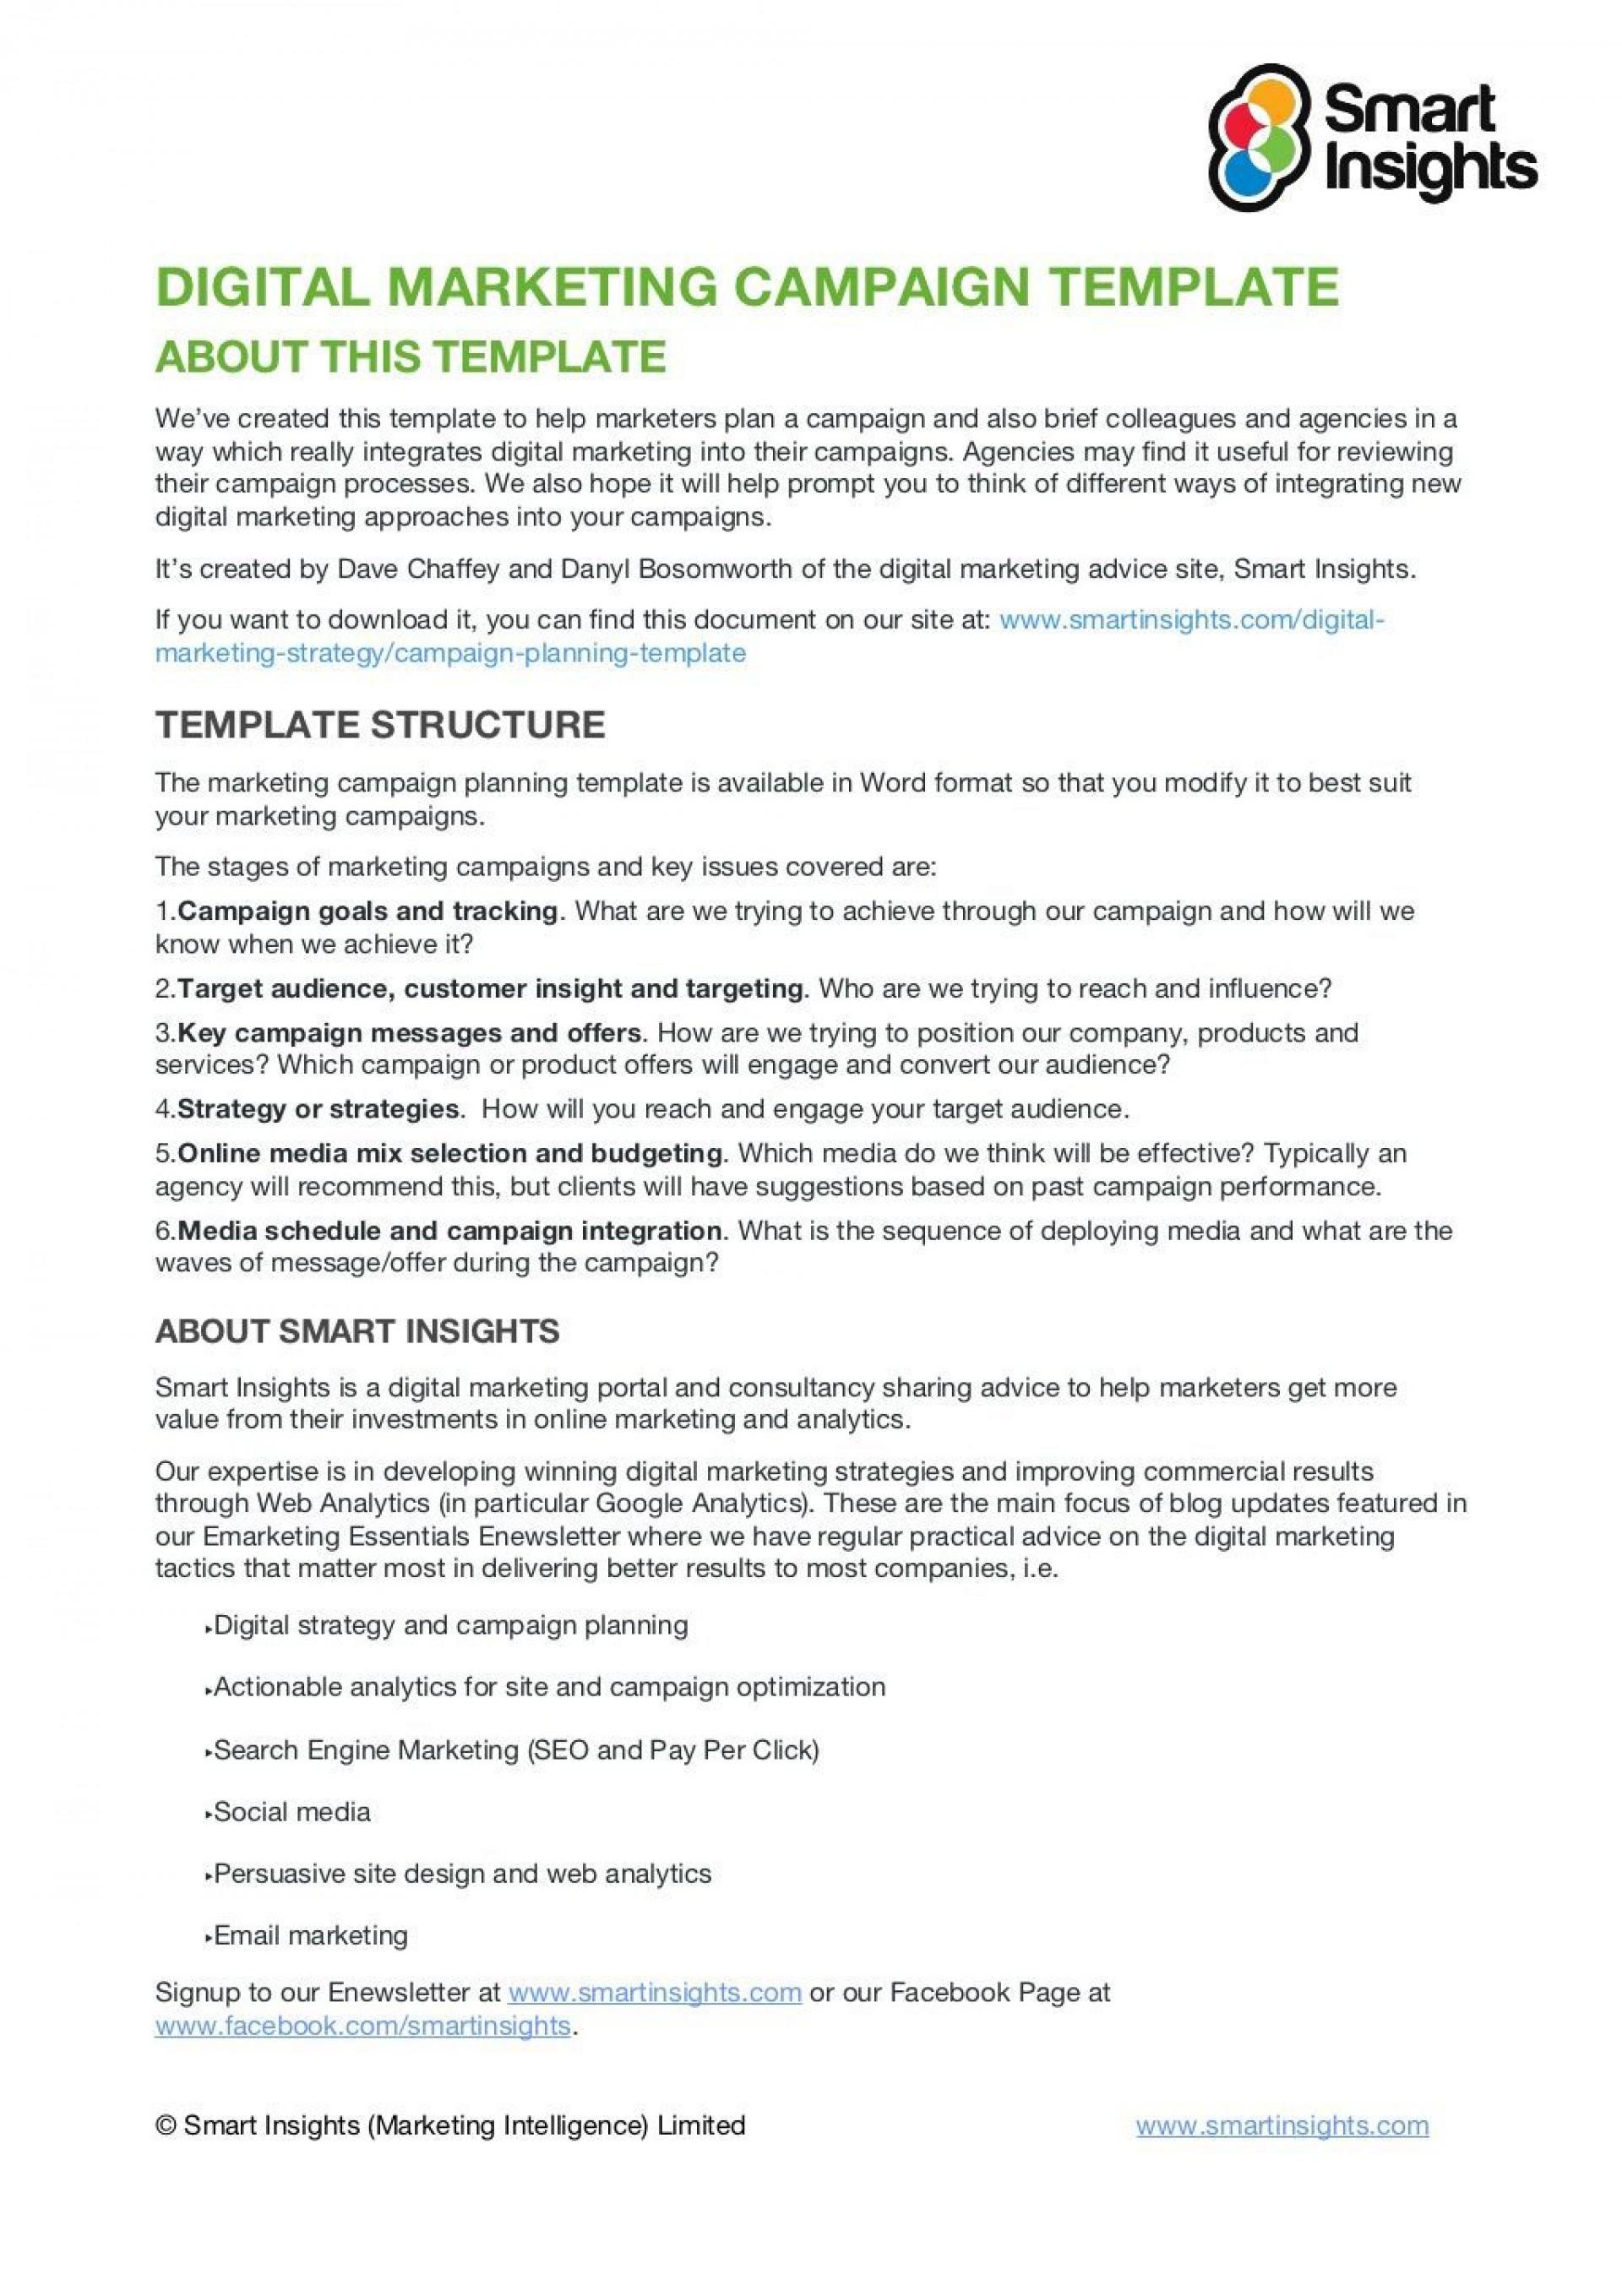 005 Top Social Media Marketing Proposal Template Word Example  Plan1920